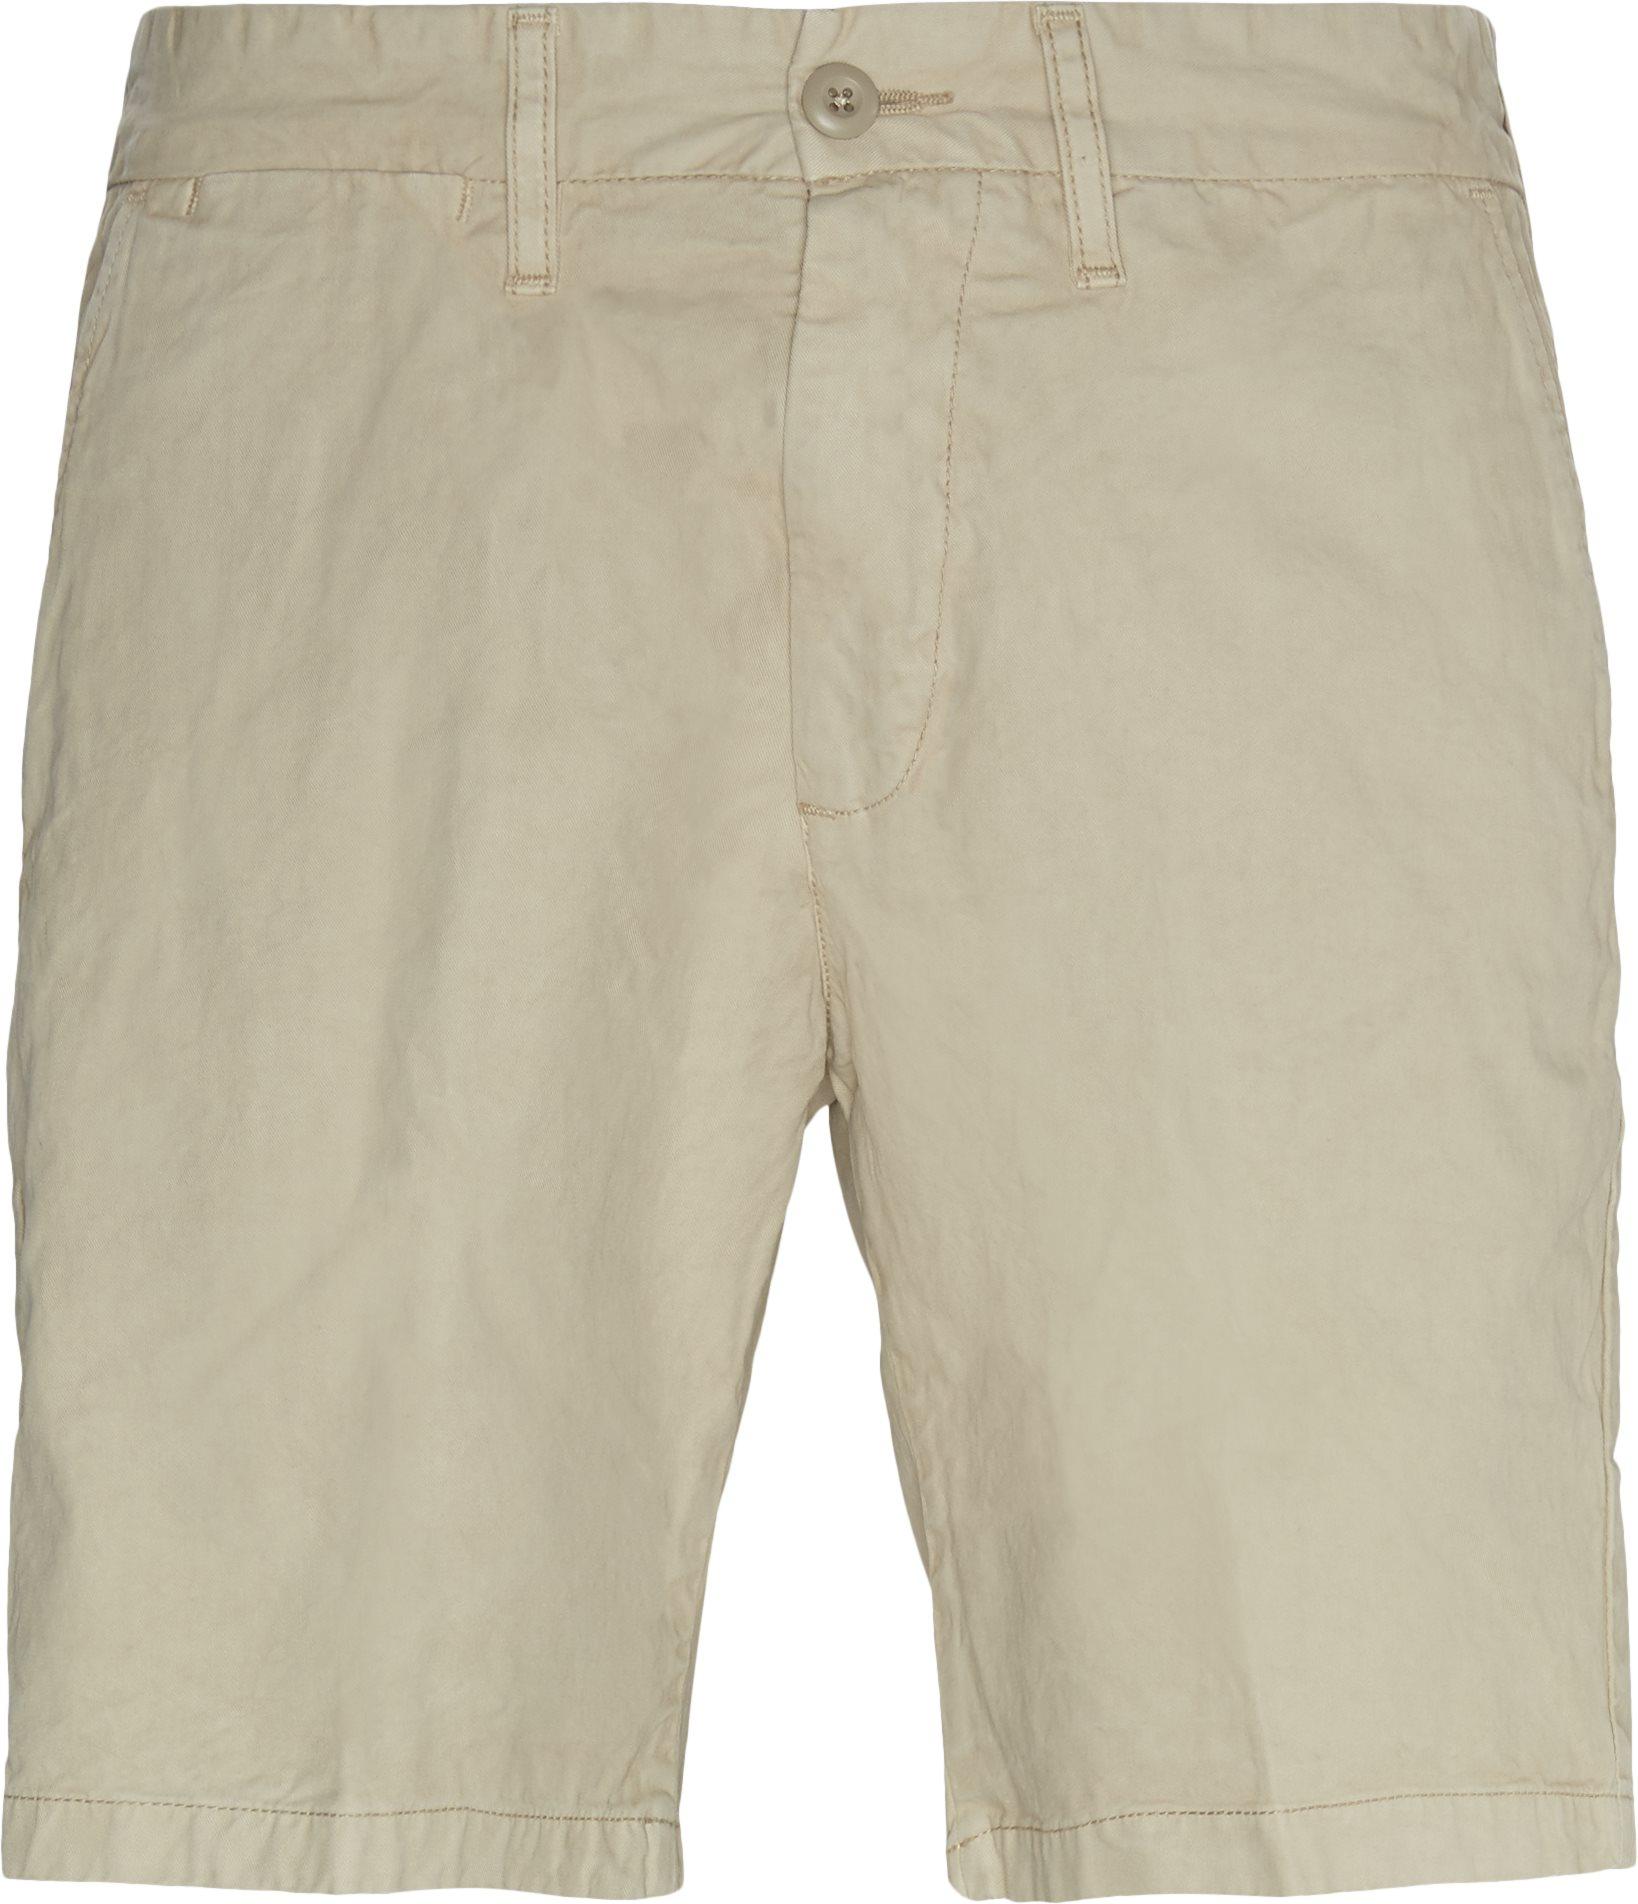 Shorts - Regular fit - Sand